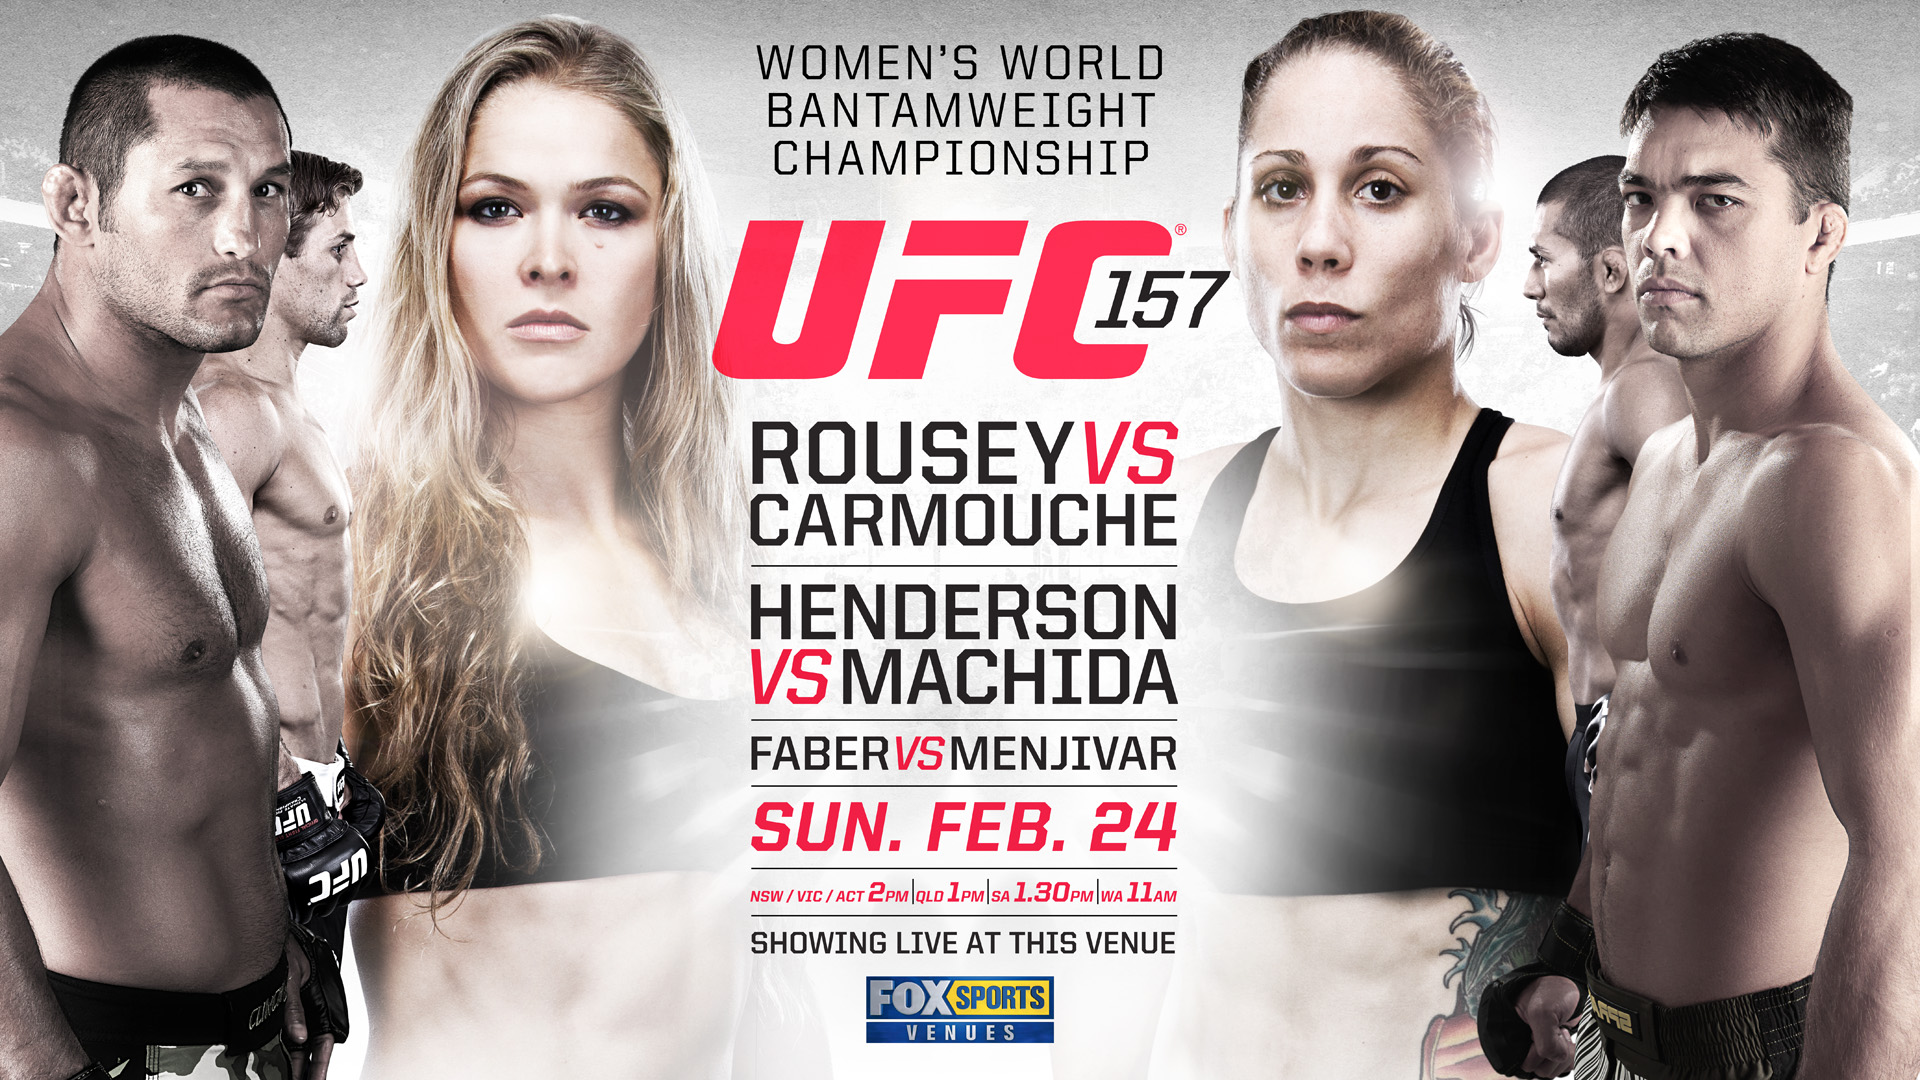 UFC157-FOXSPORT-16x9